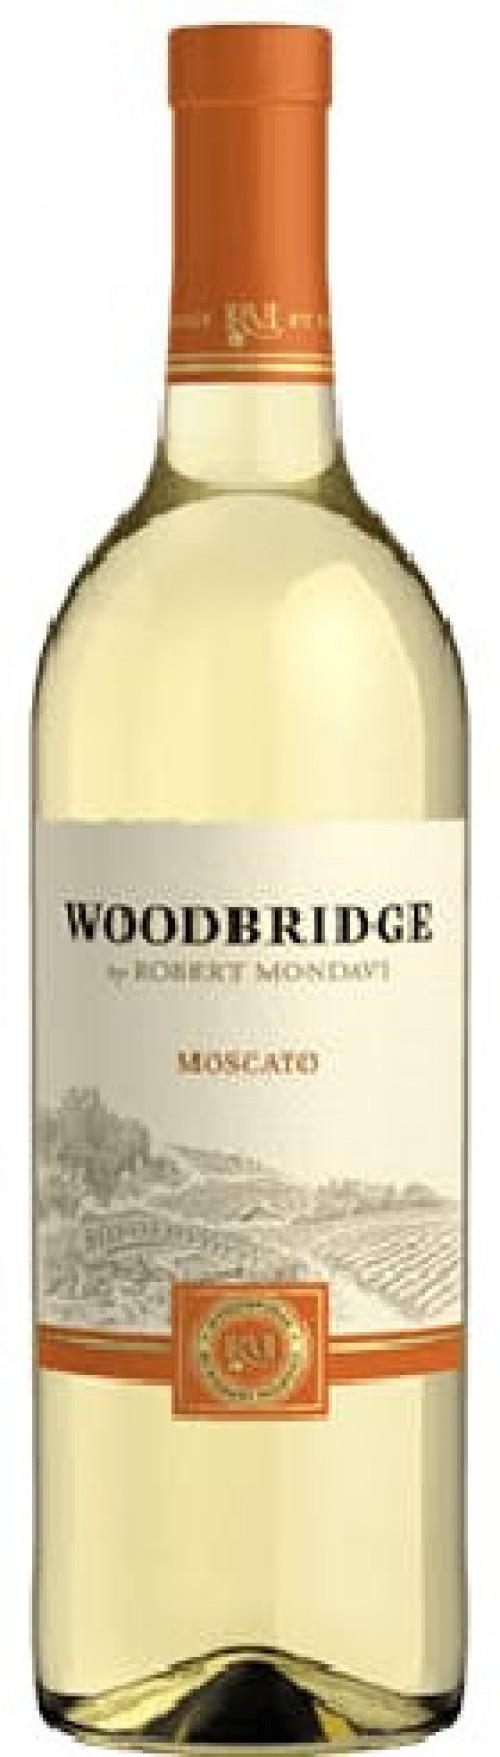 Woodbridge Moscato 750ml NV